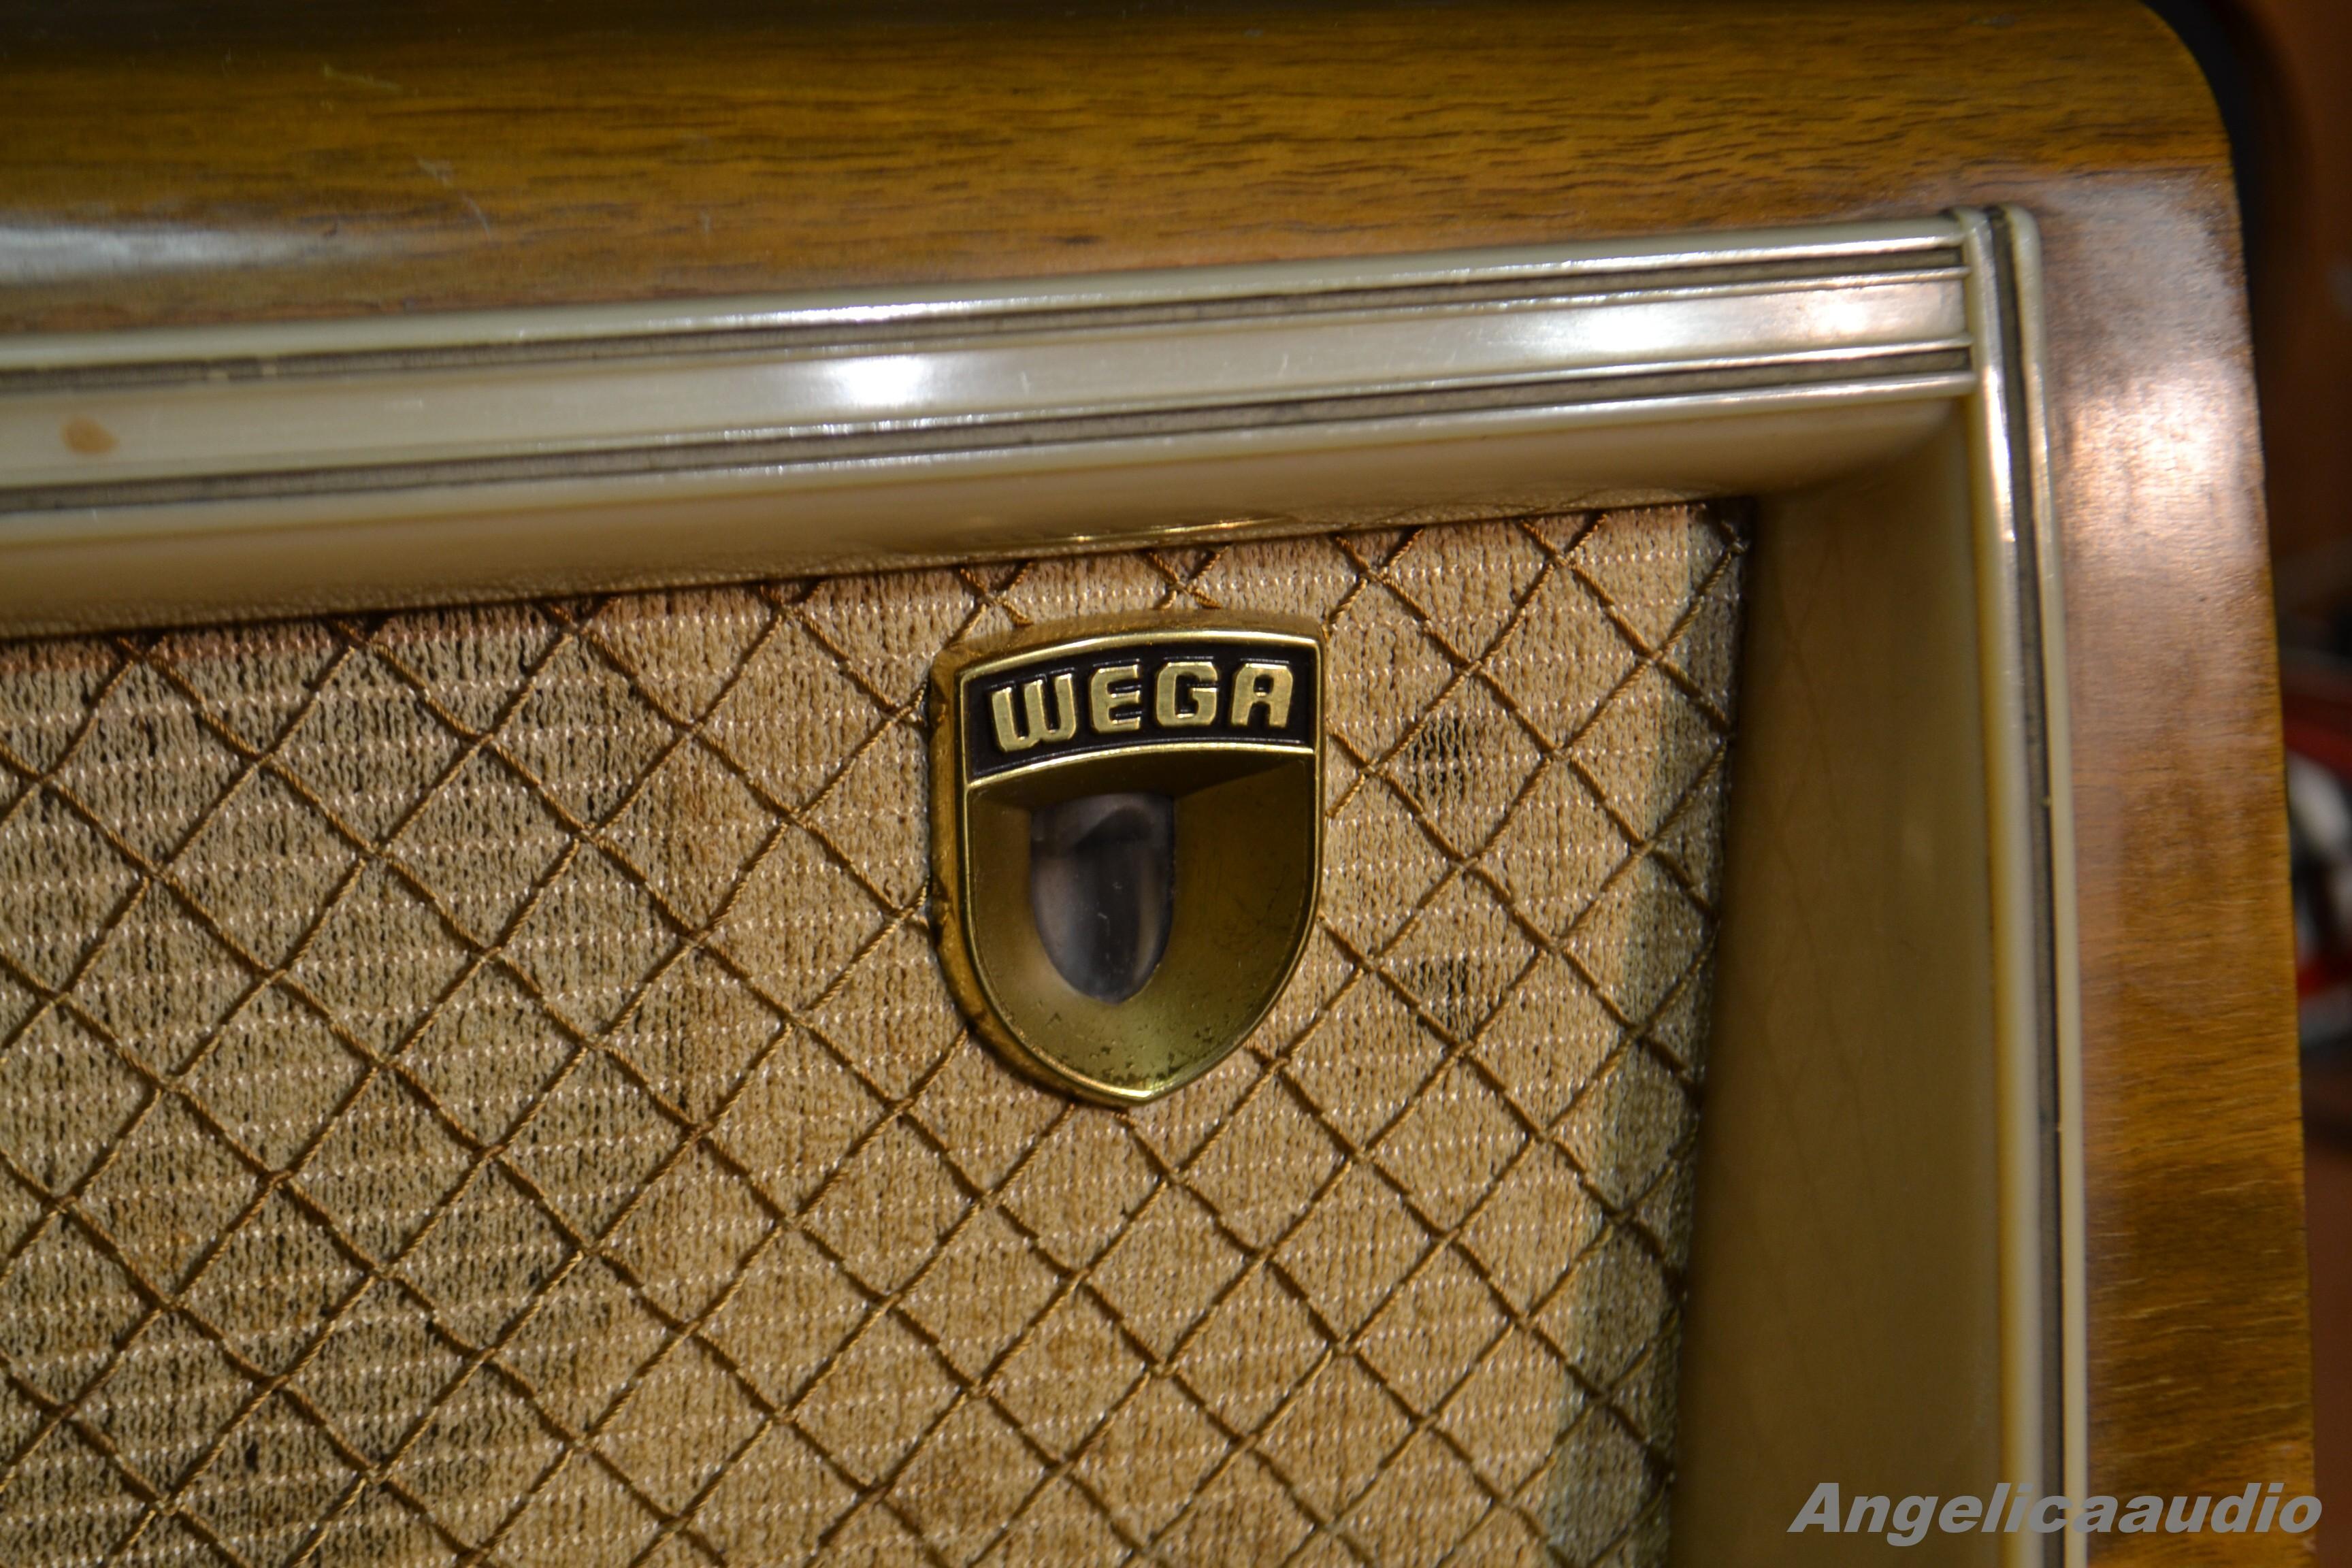 Wega 202 Wega Radio Stuttgart 1957 1958 Angelicaaudio